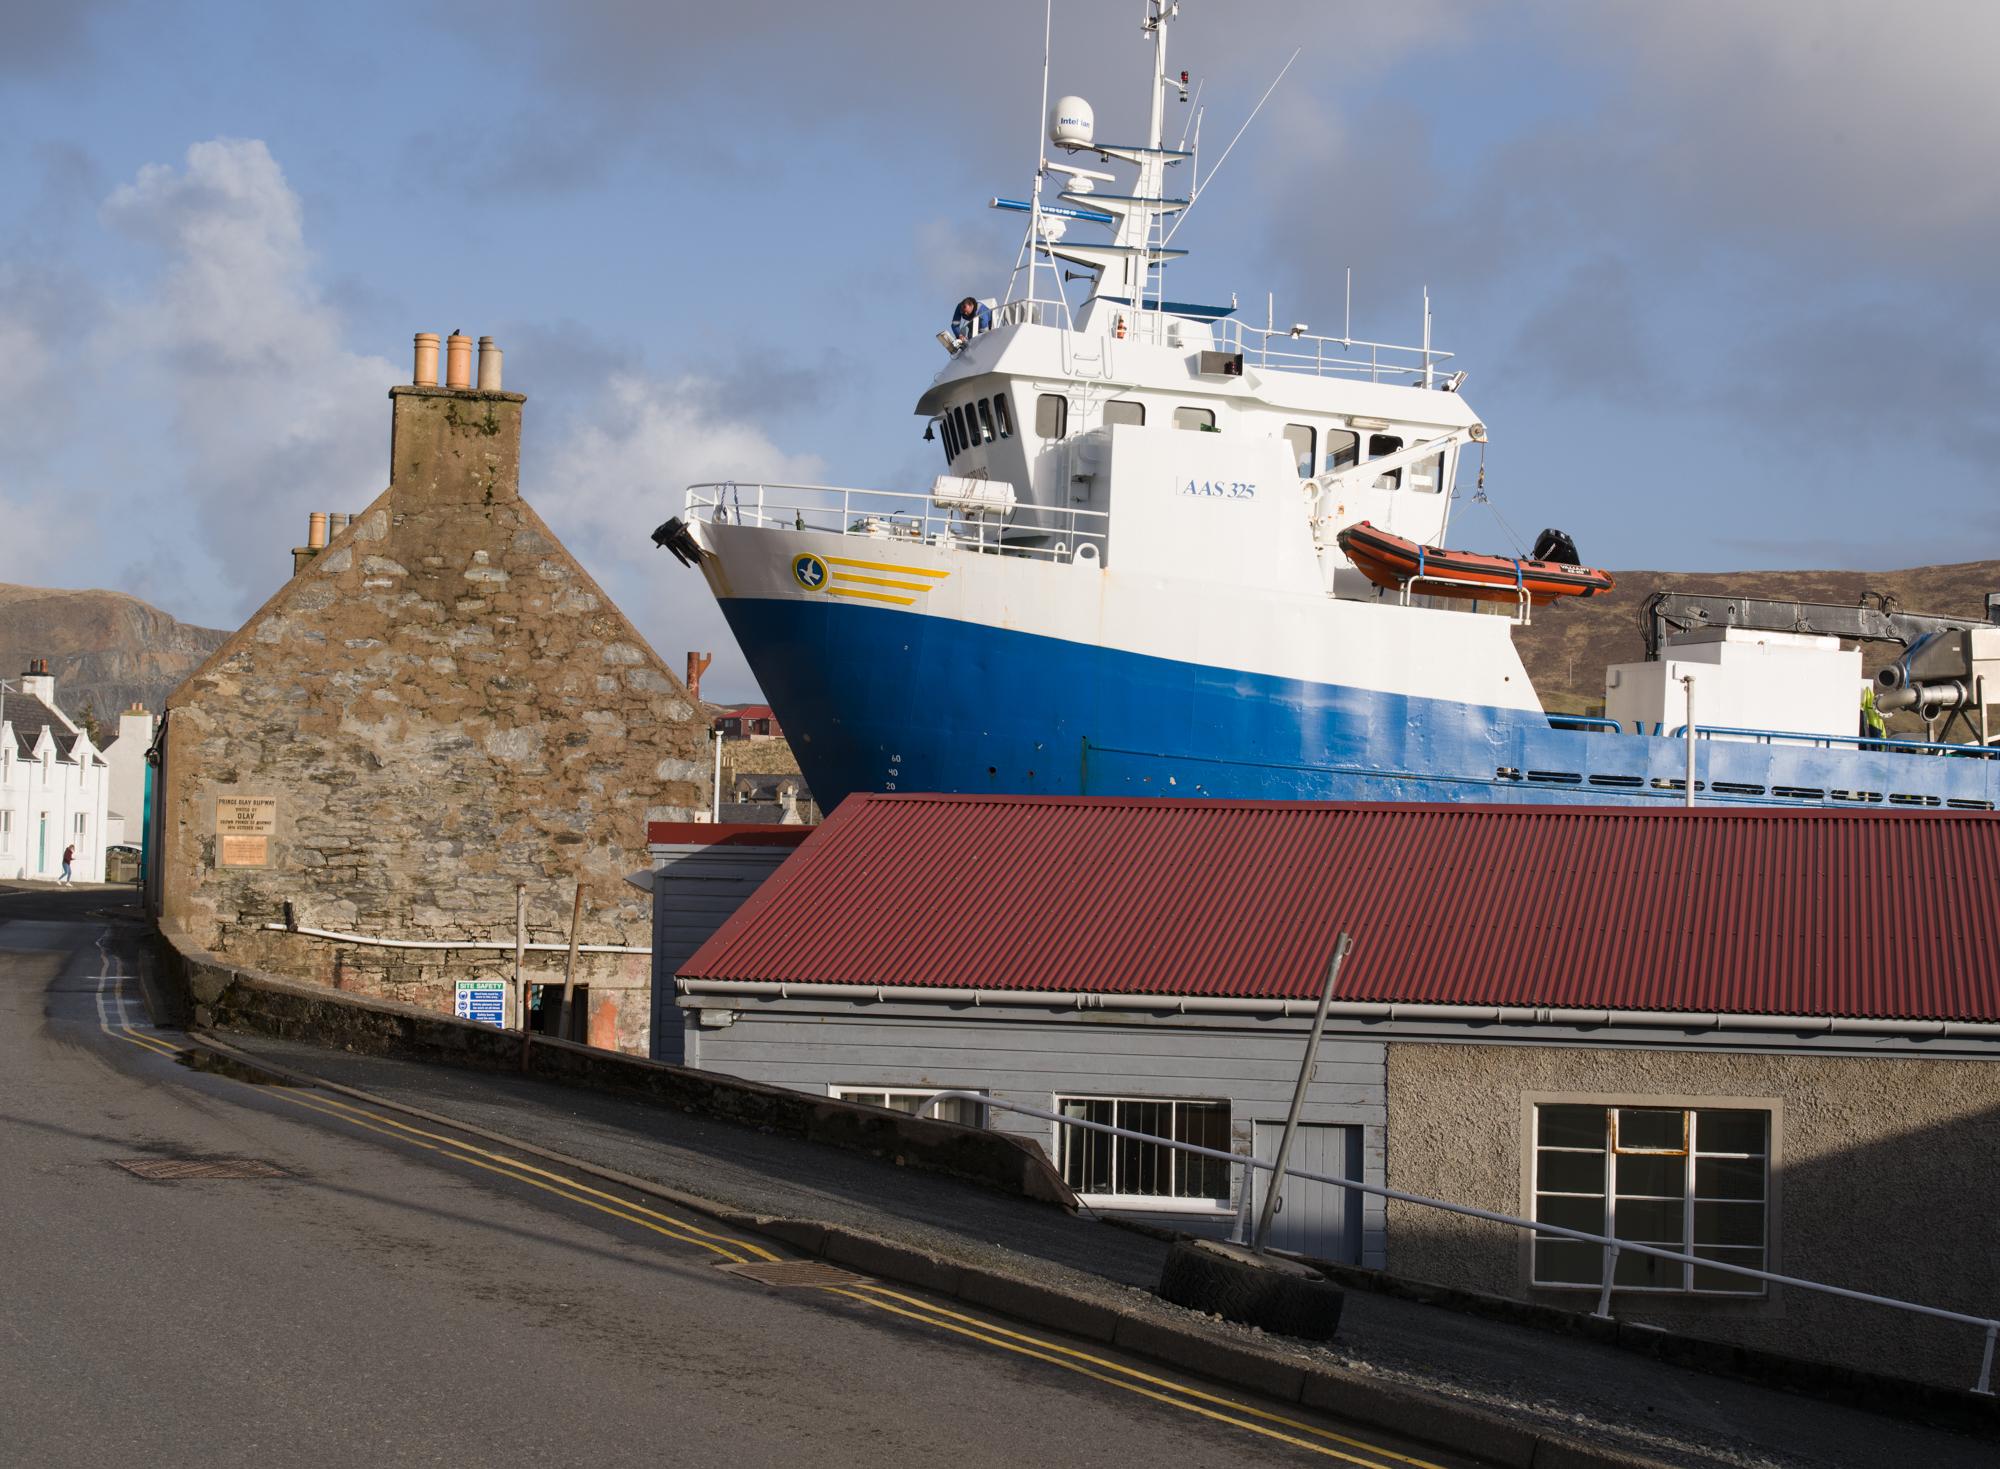 Shetland04.jpg